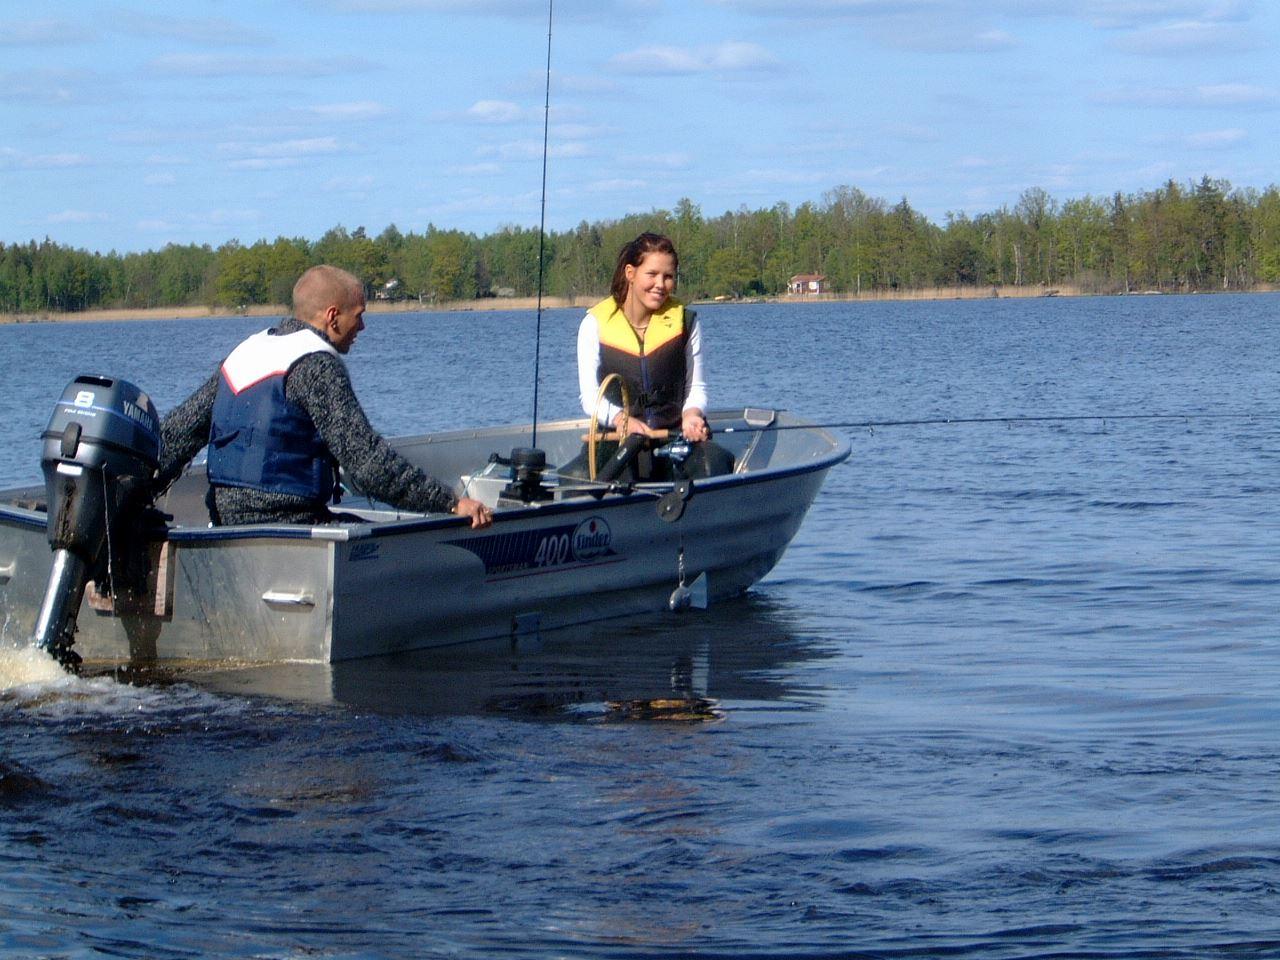 Båt- & kanotuthyrning: Torne Camping